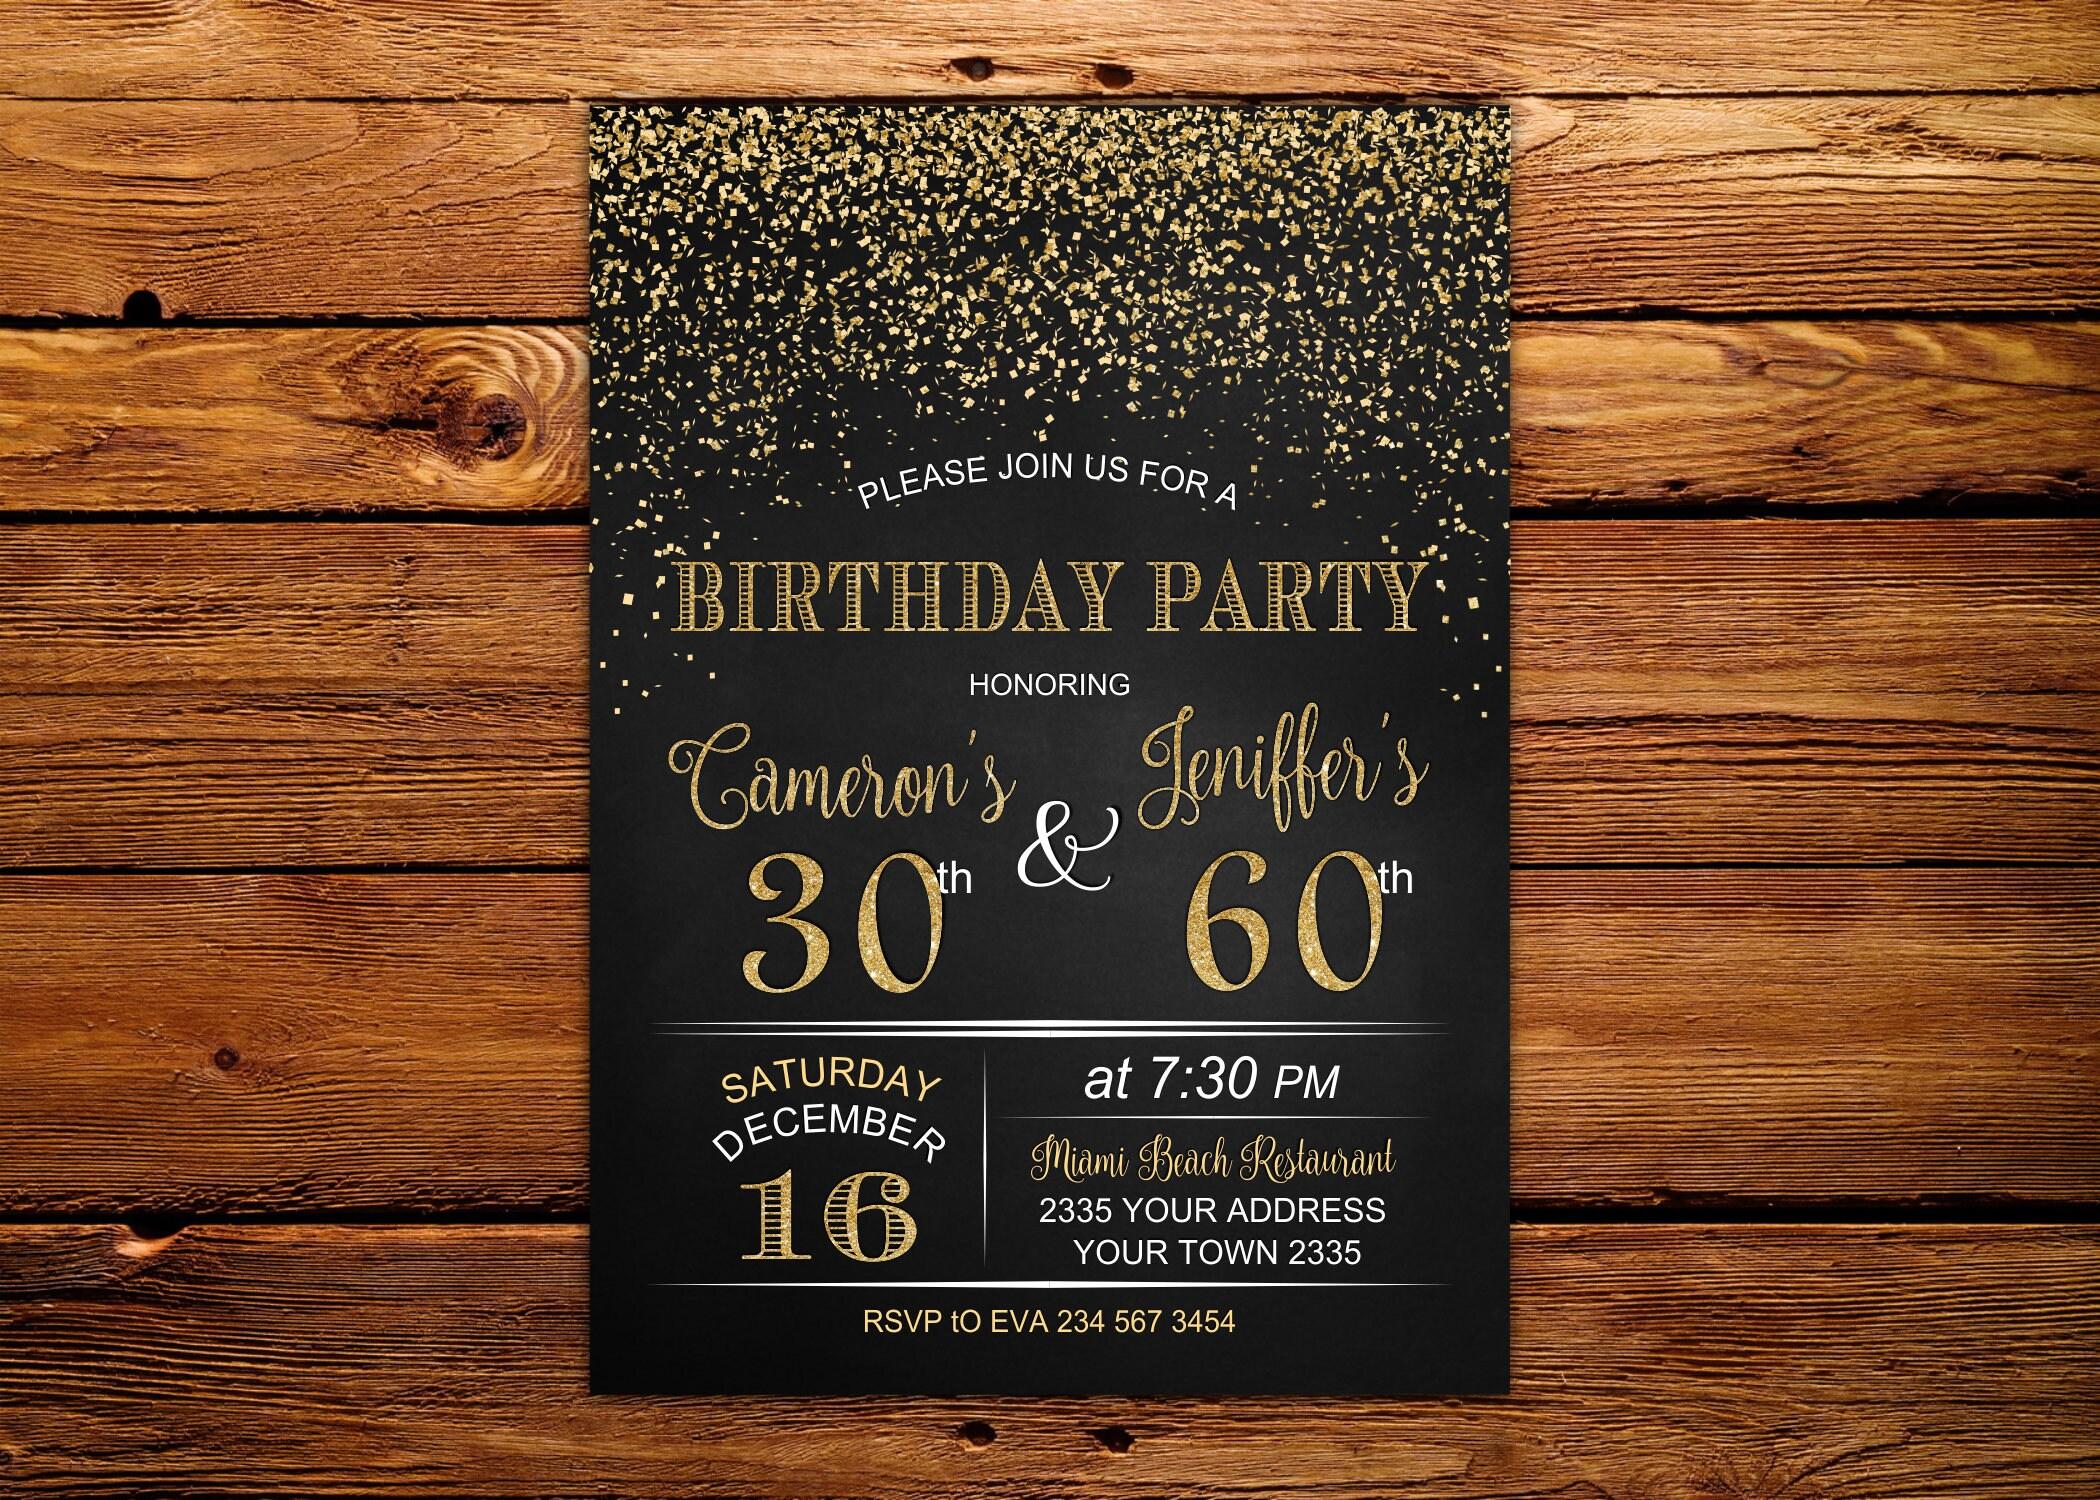 Adult joint birthday invitation joint birthday party invitation adult joint birthday invitation joint birthday party invitation combined party co birthday filmwisefo